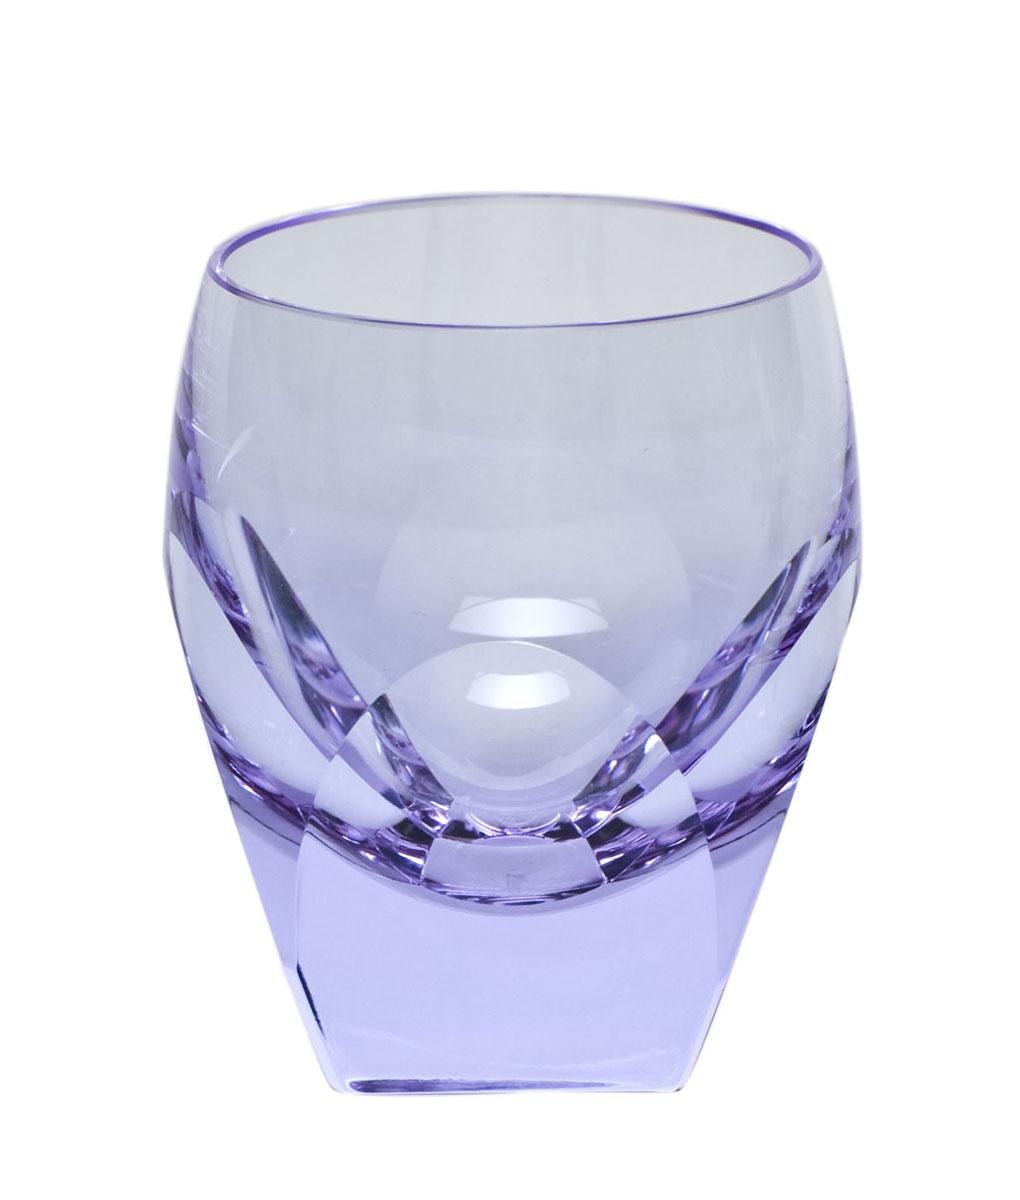 Moser Crystal Bar Shot Glass 1.5 Oz. Alexandrite